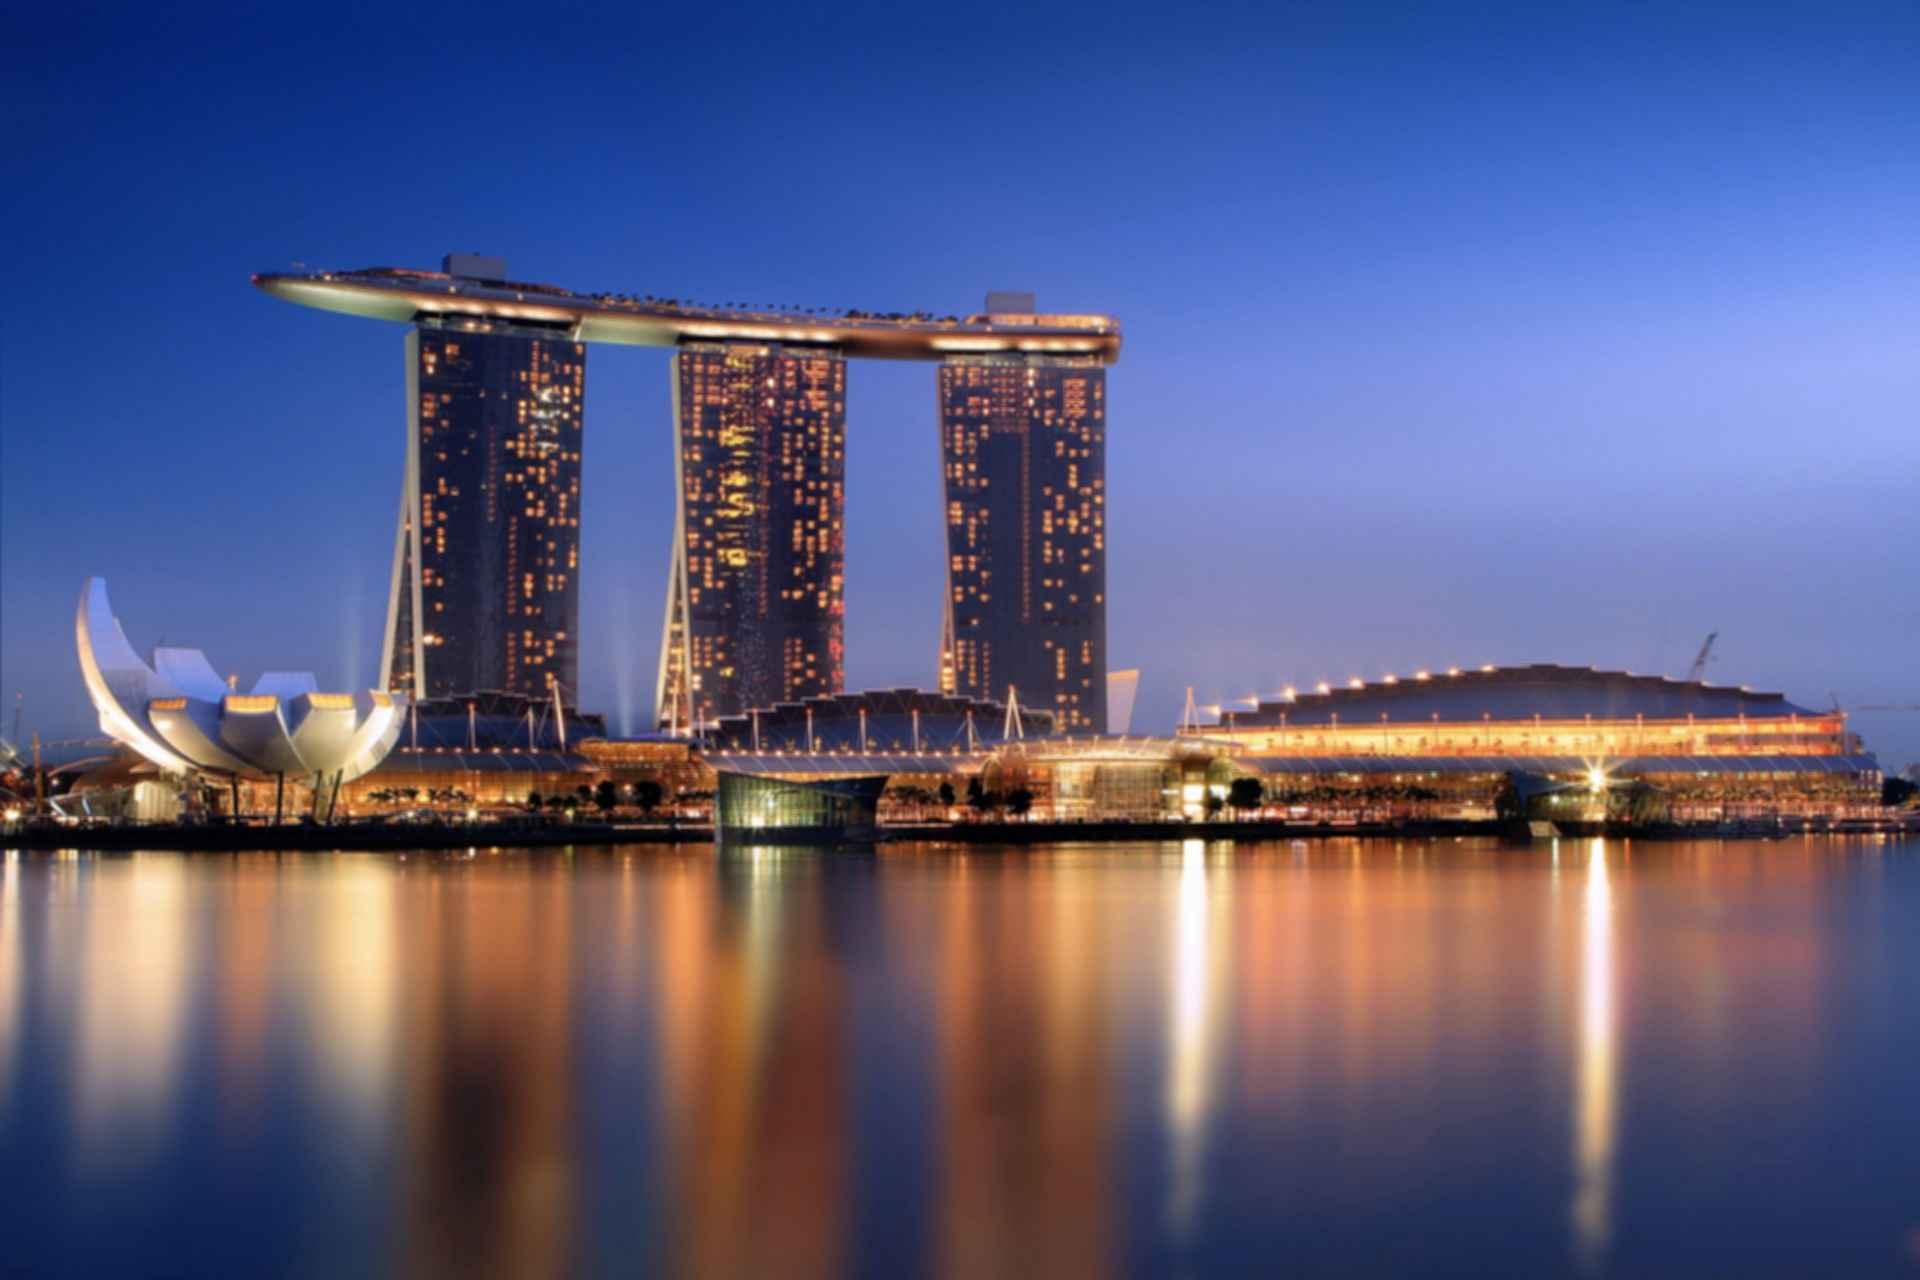 Marina Bay Sands Exterior At Night Modlar Com